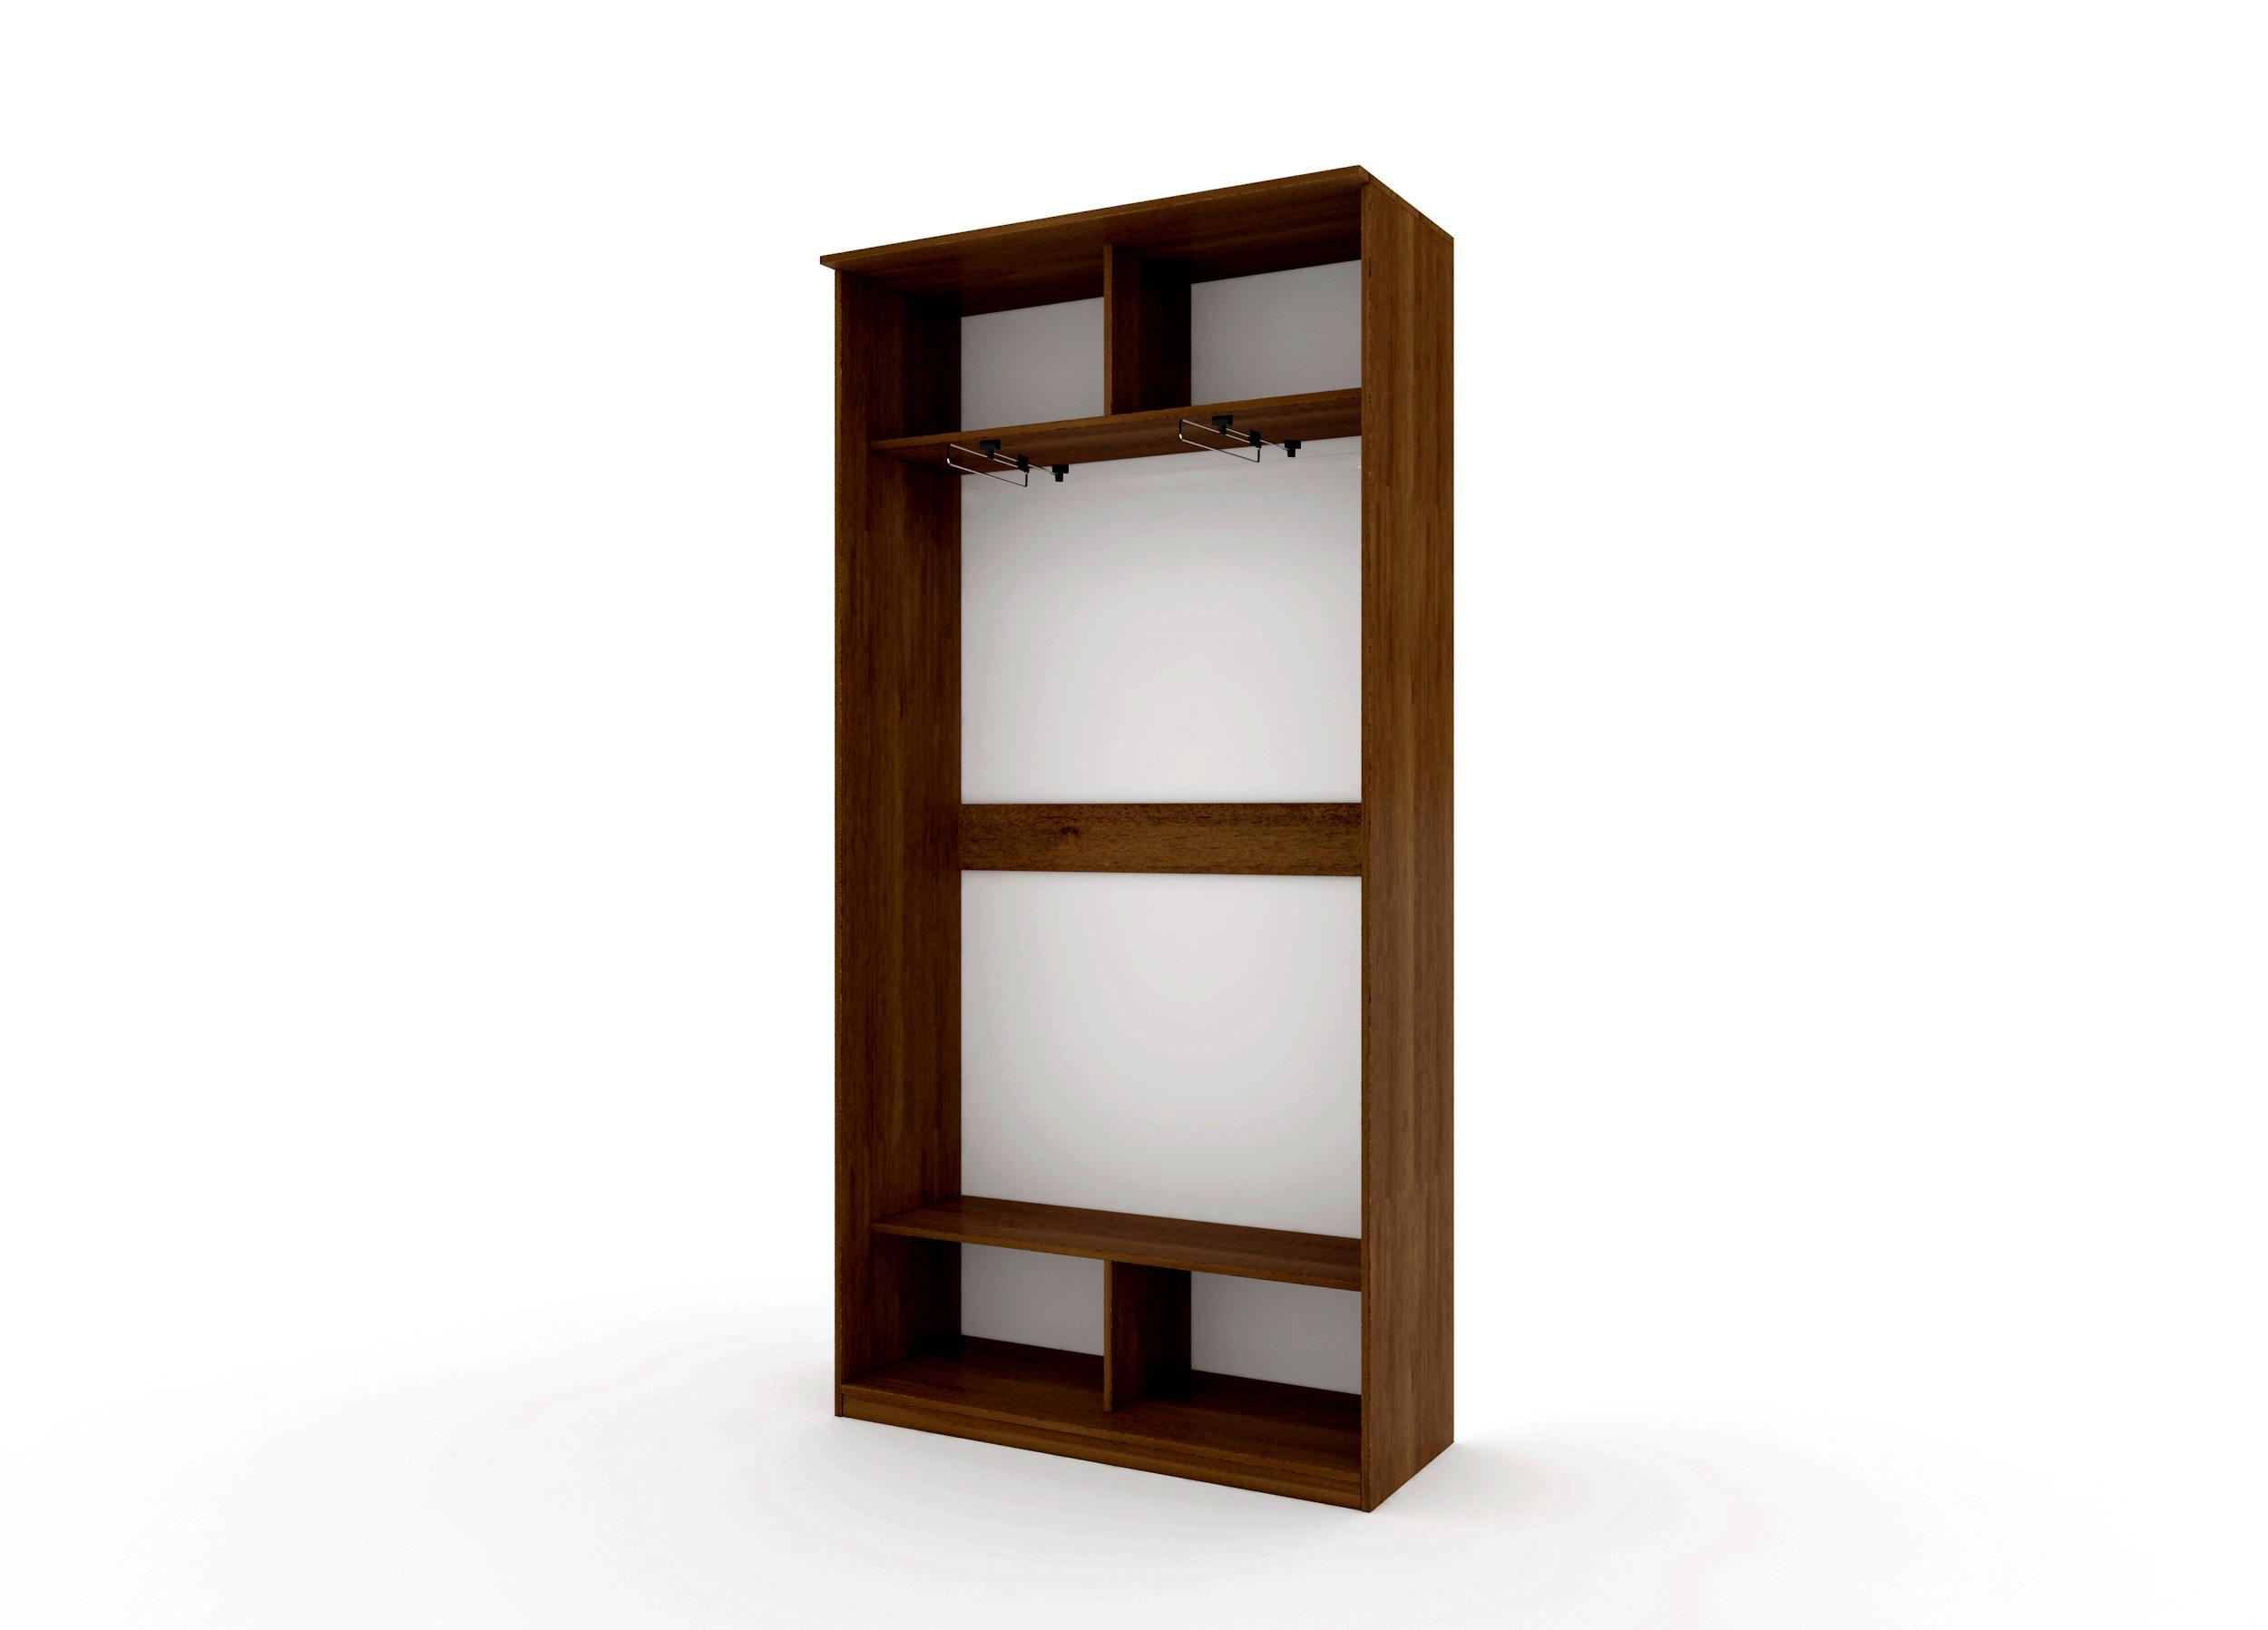 Шкаф купе Топ-Лайн 1190 / 450 / 1 секция / 1 зеркало